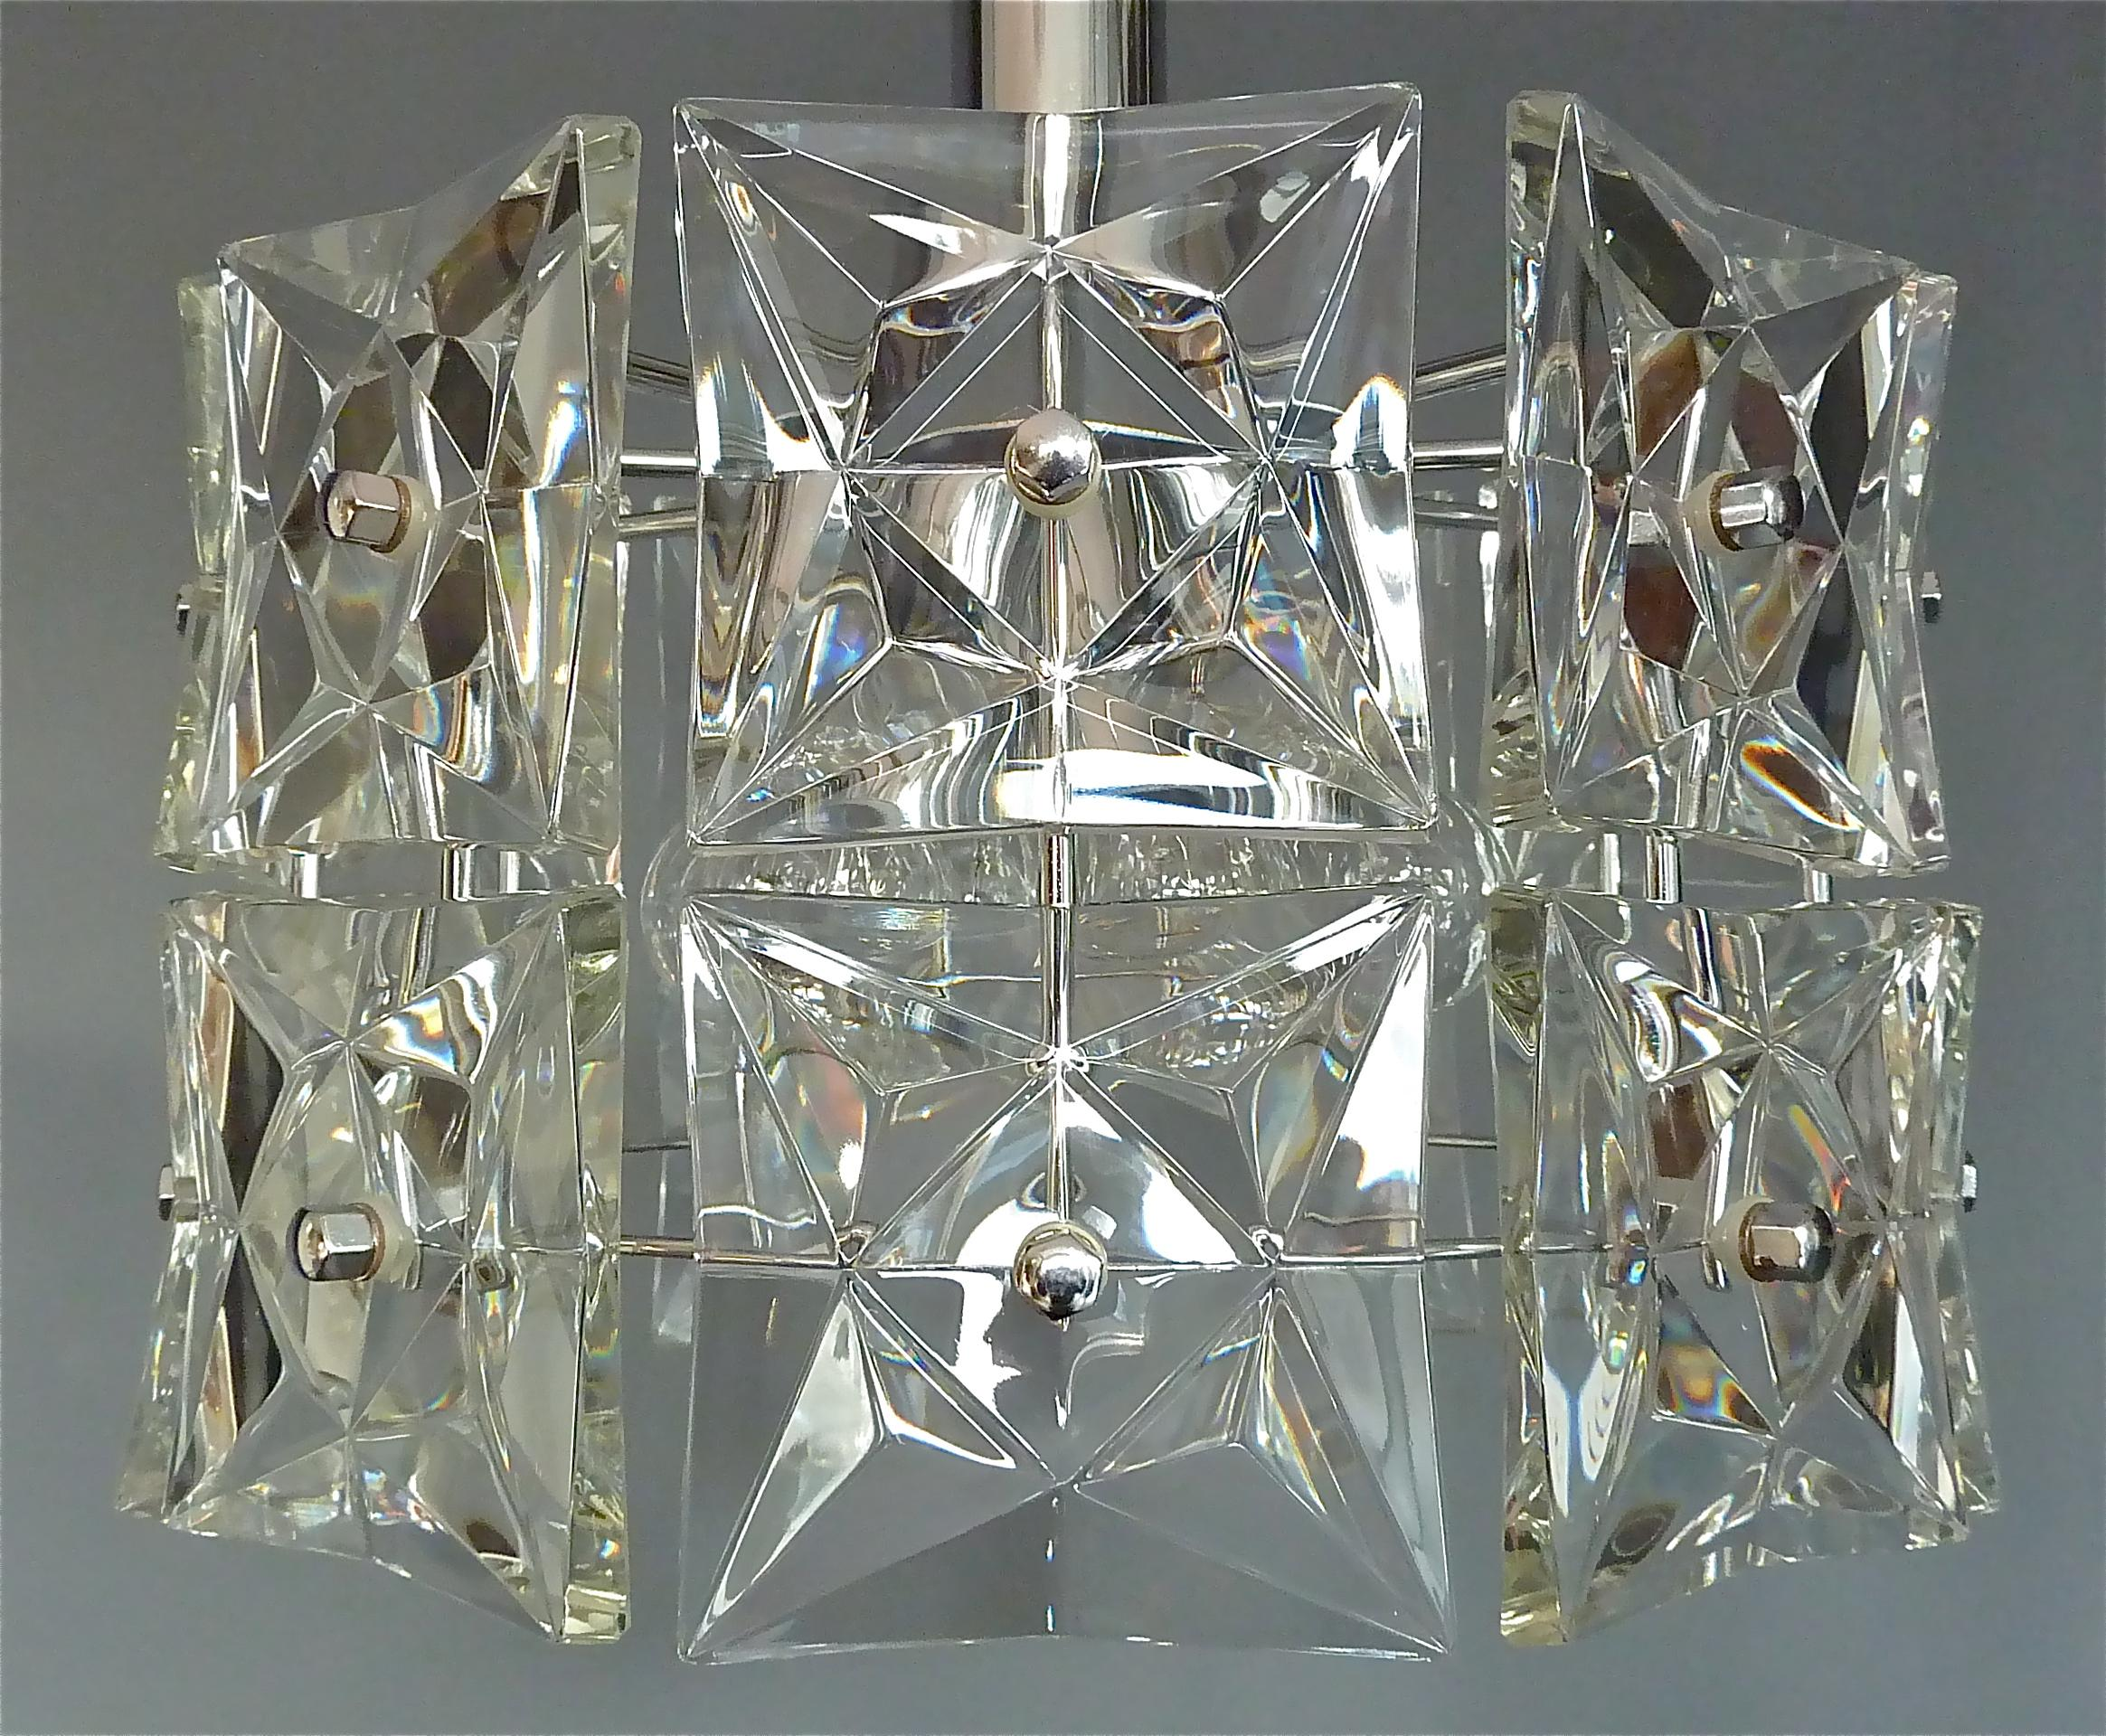 Kronleuchter Kristall Klein ~ Moderner kinkeldey kronleuchter kristall glas chrom deutschland